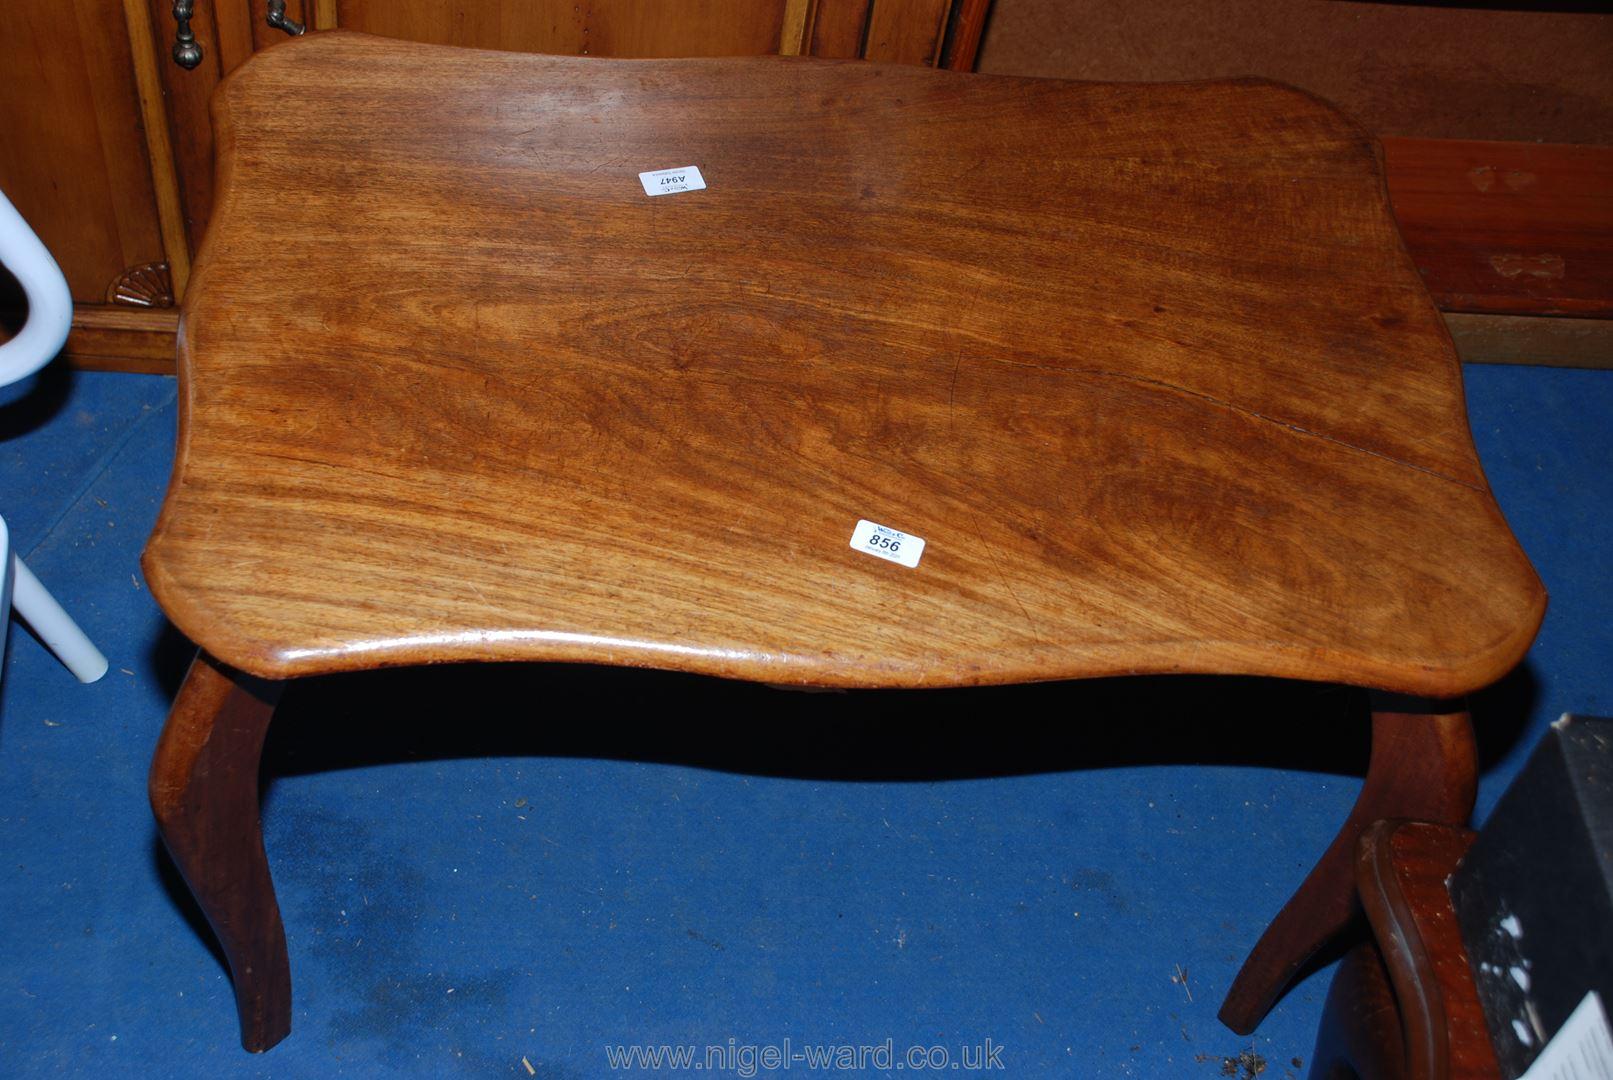 "A hardwood coffee table apx 34"" x 21"" (inc leg width) x 19"" high."